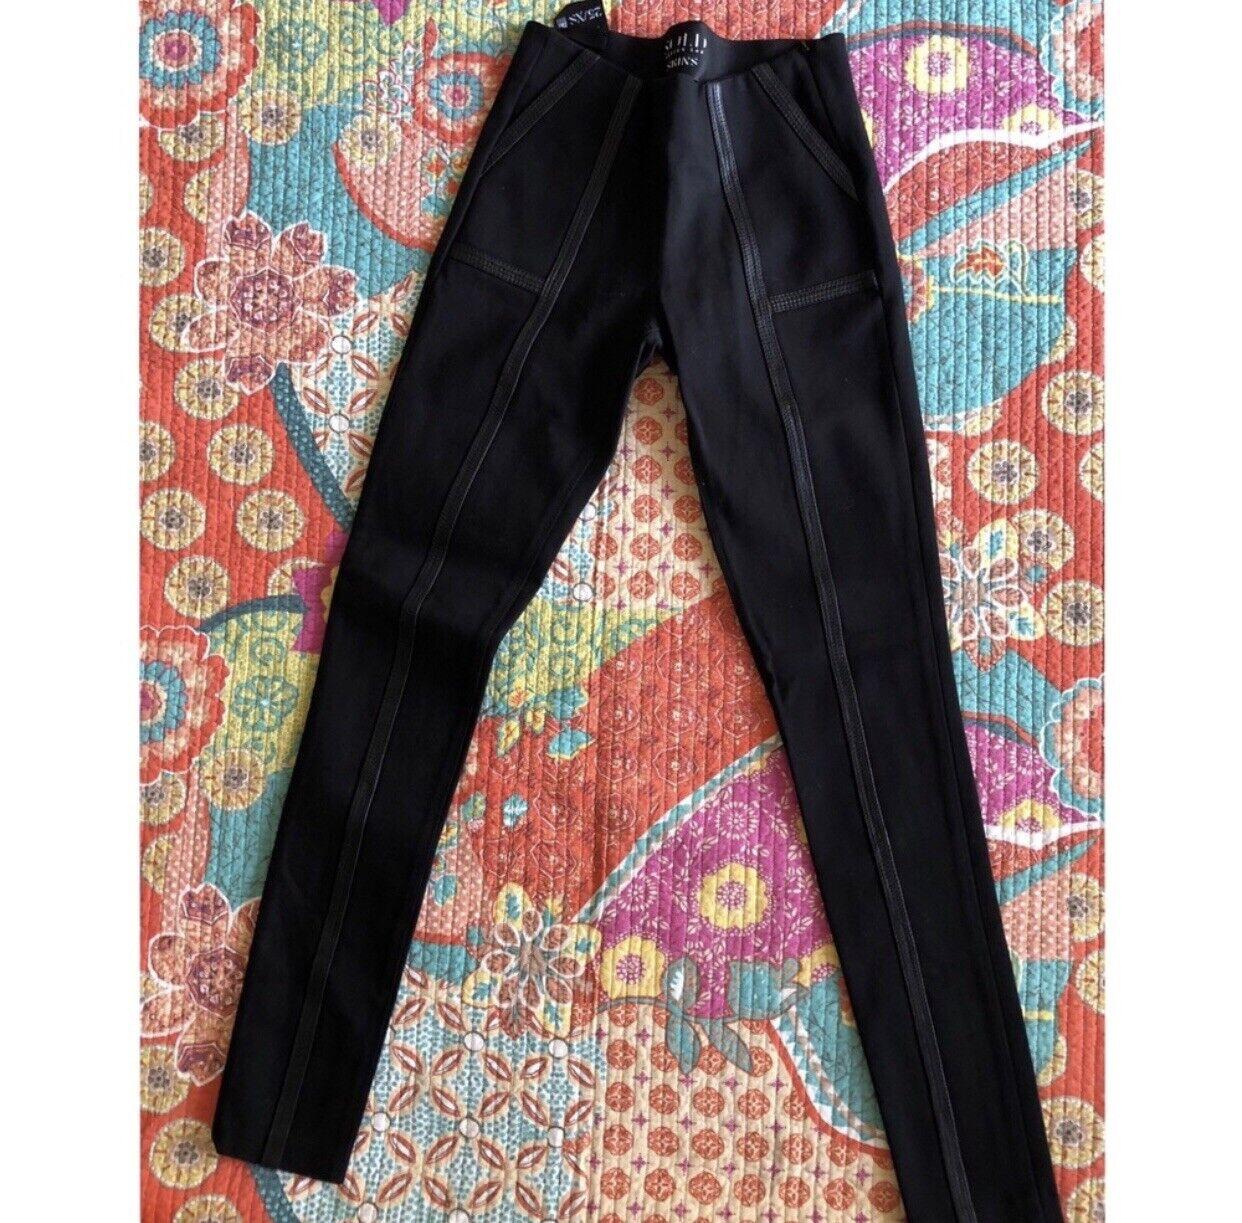 Nouveau vendu Designs SOHO Peau À Enfiler En Cuir Skinny 360 Pantalon Stretch Pantalon 25